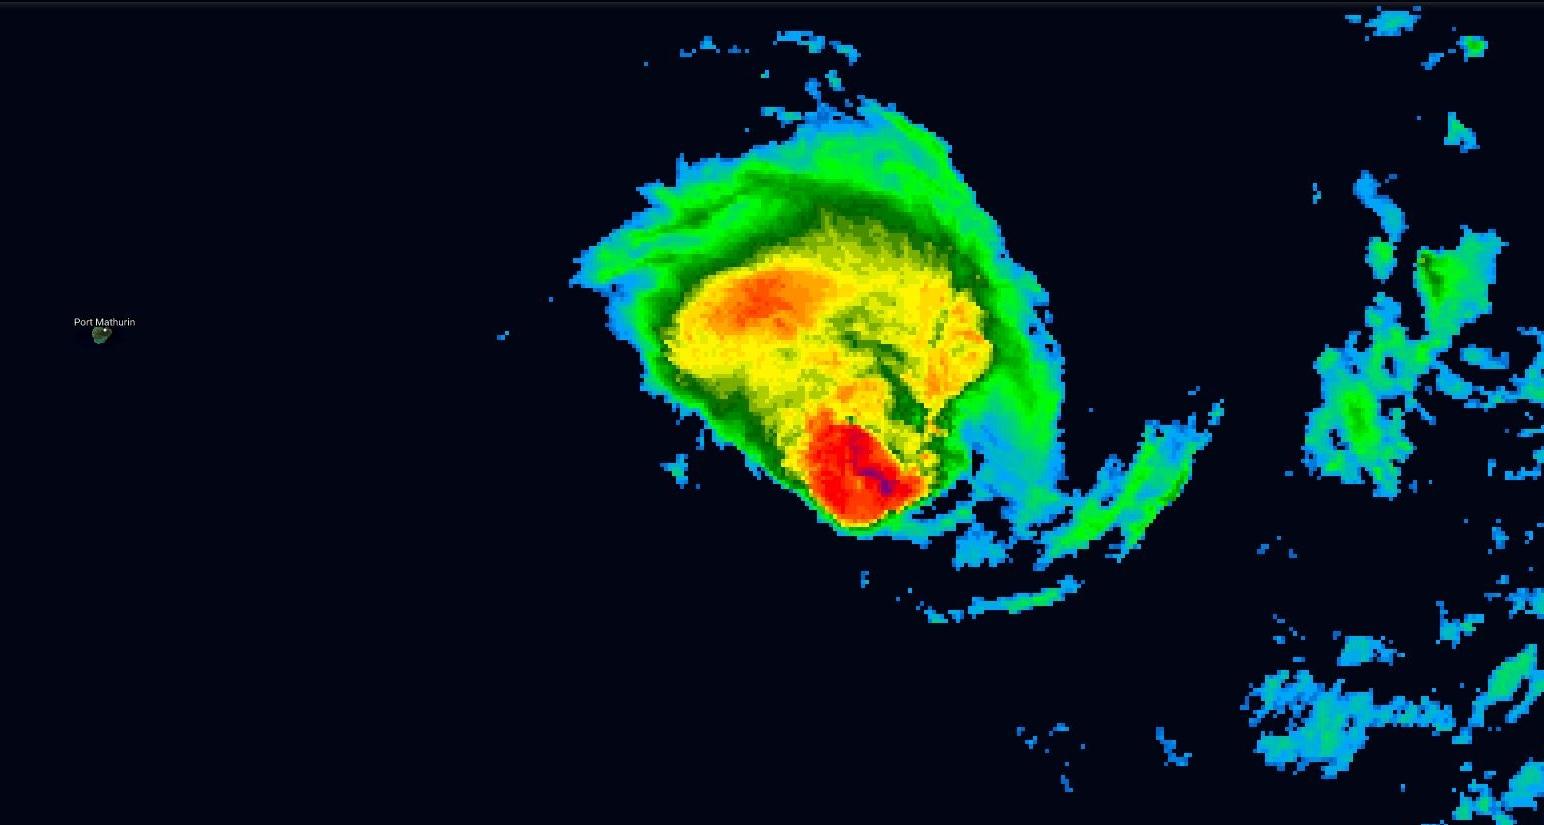 HALEH(17S) perd de sa superbe, photo satellite à midi.